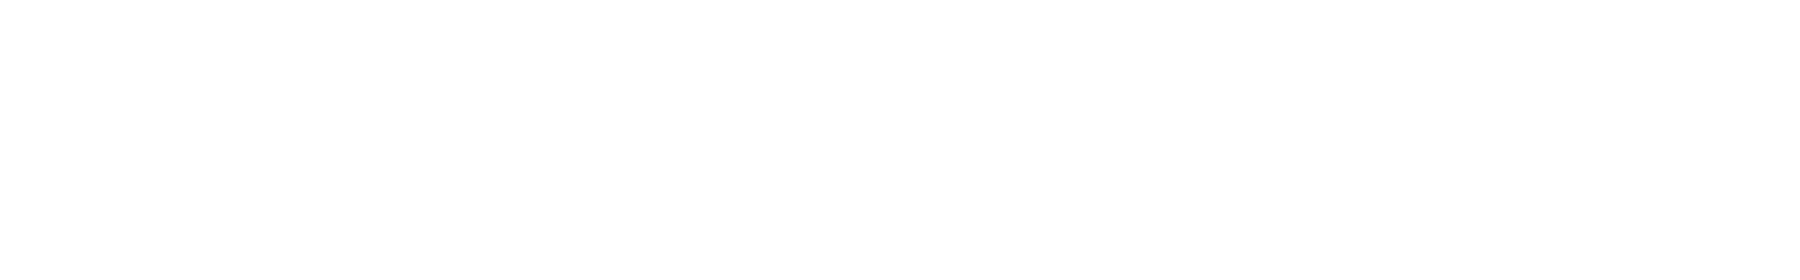 vedh melodyloop 093 gm7 am7 dm7 126bpm